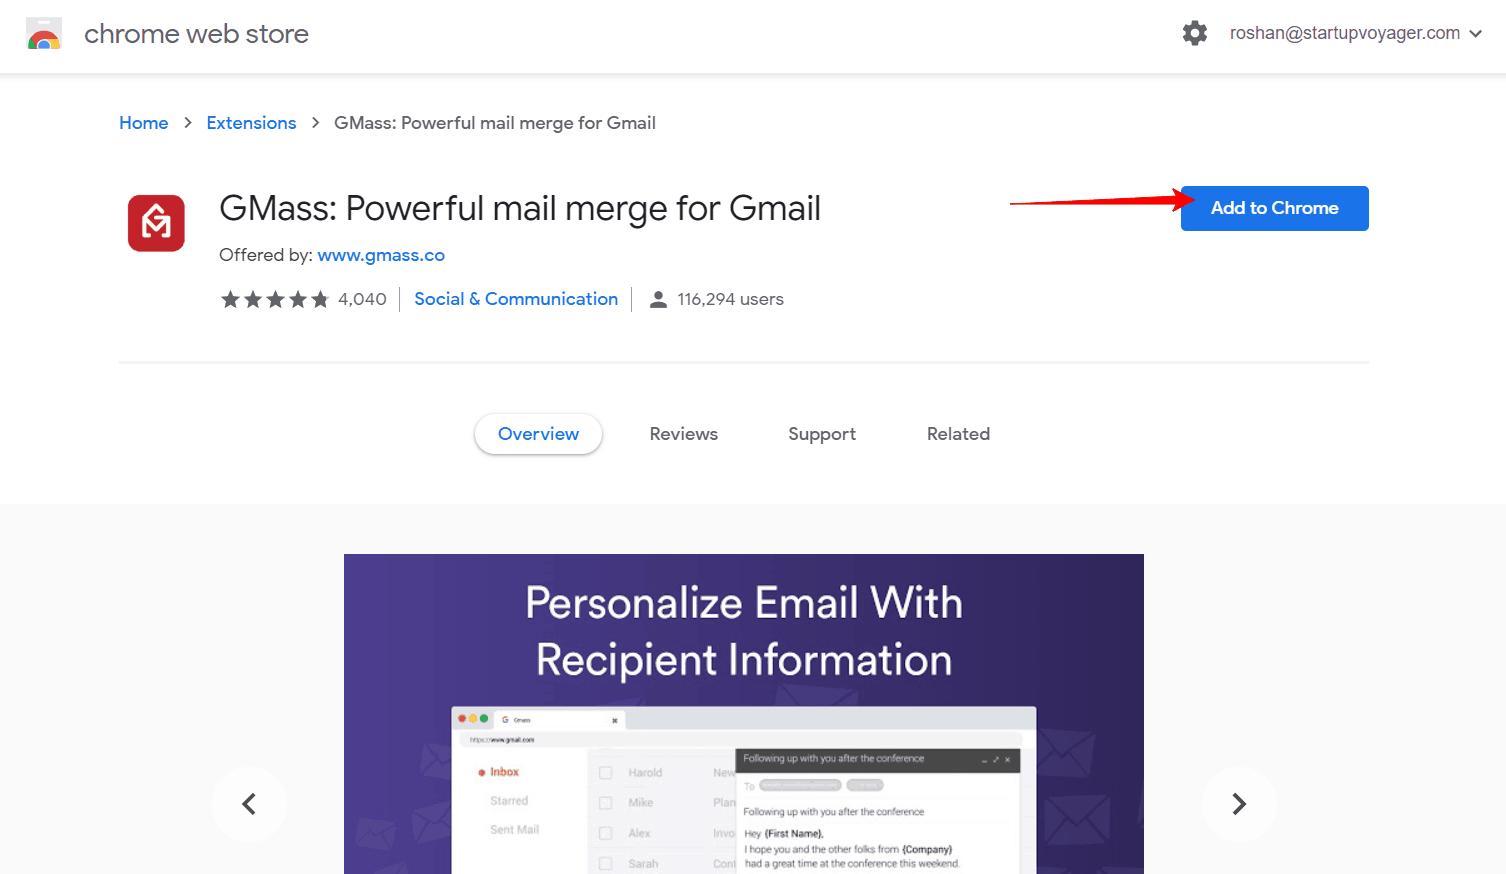 GMass Chrome Web Extension page.